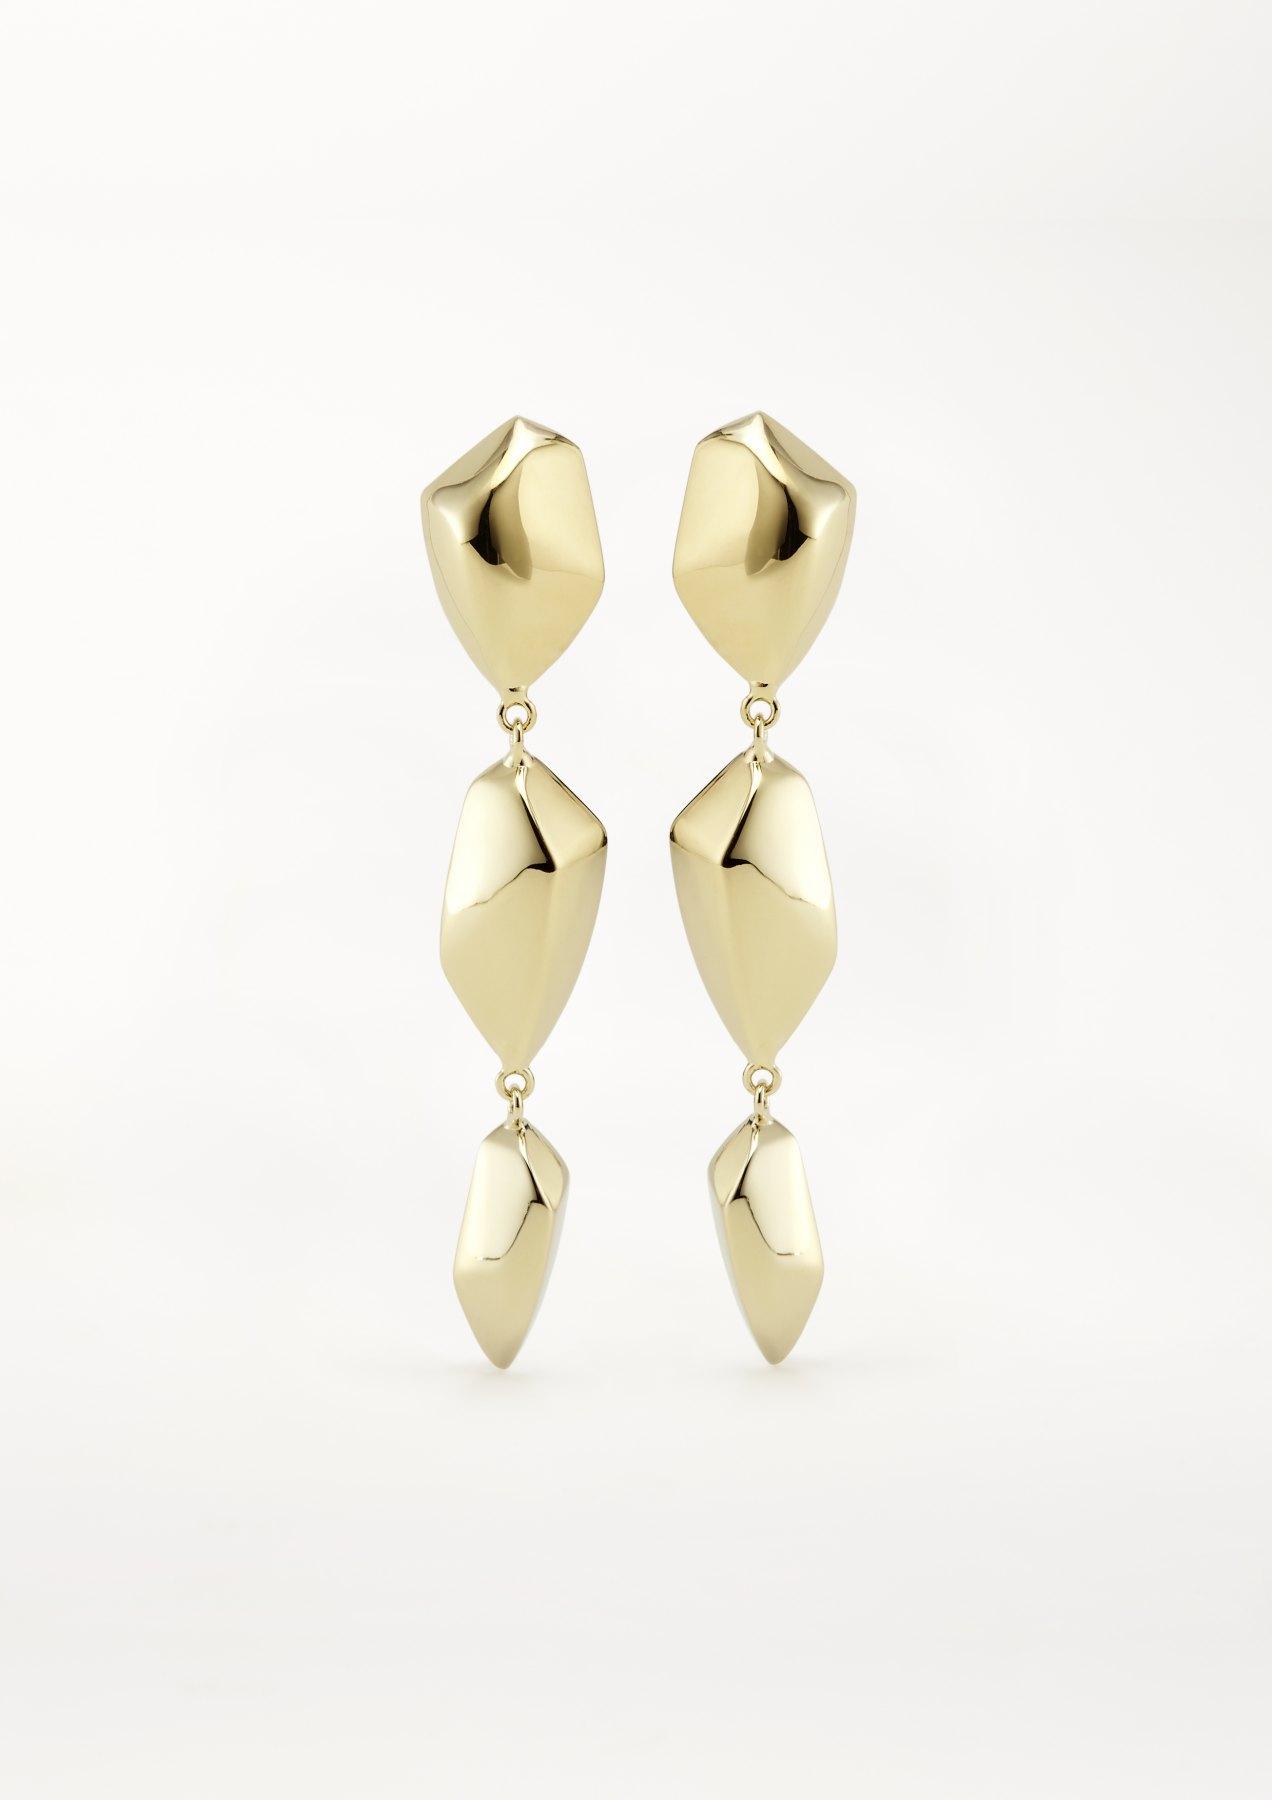 xenia bous jewellery washed stone 08 stars in the sky chandelier earrings gold silver